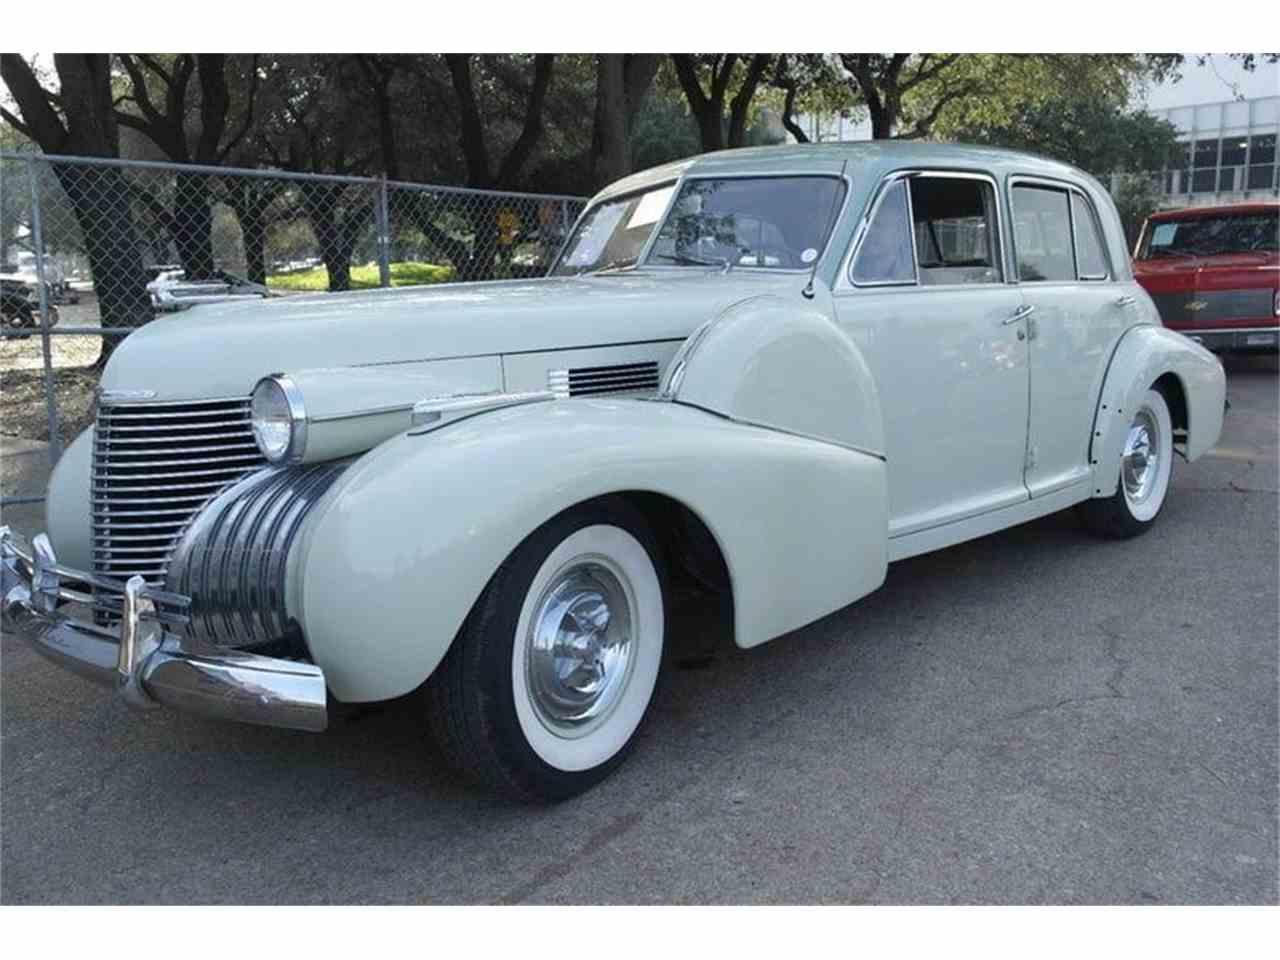 Classic Cars For Sale Iowa City